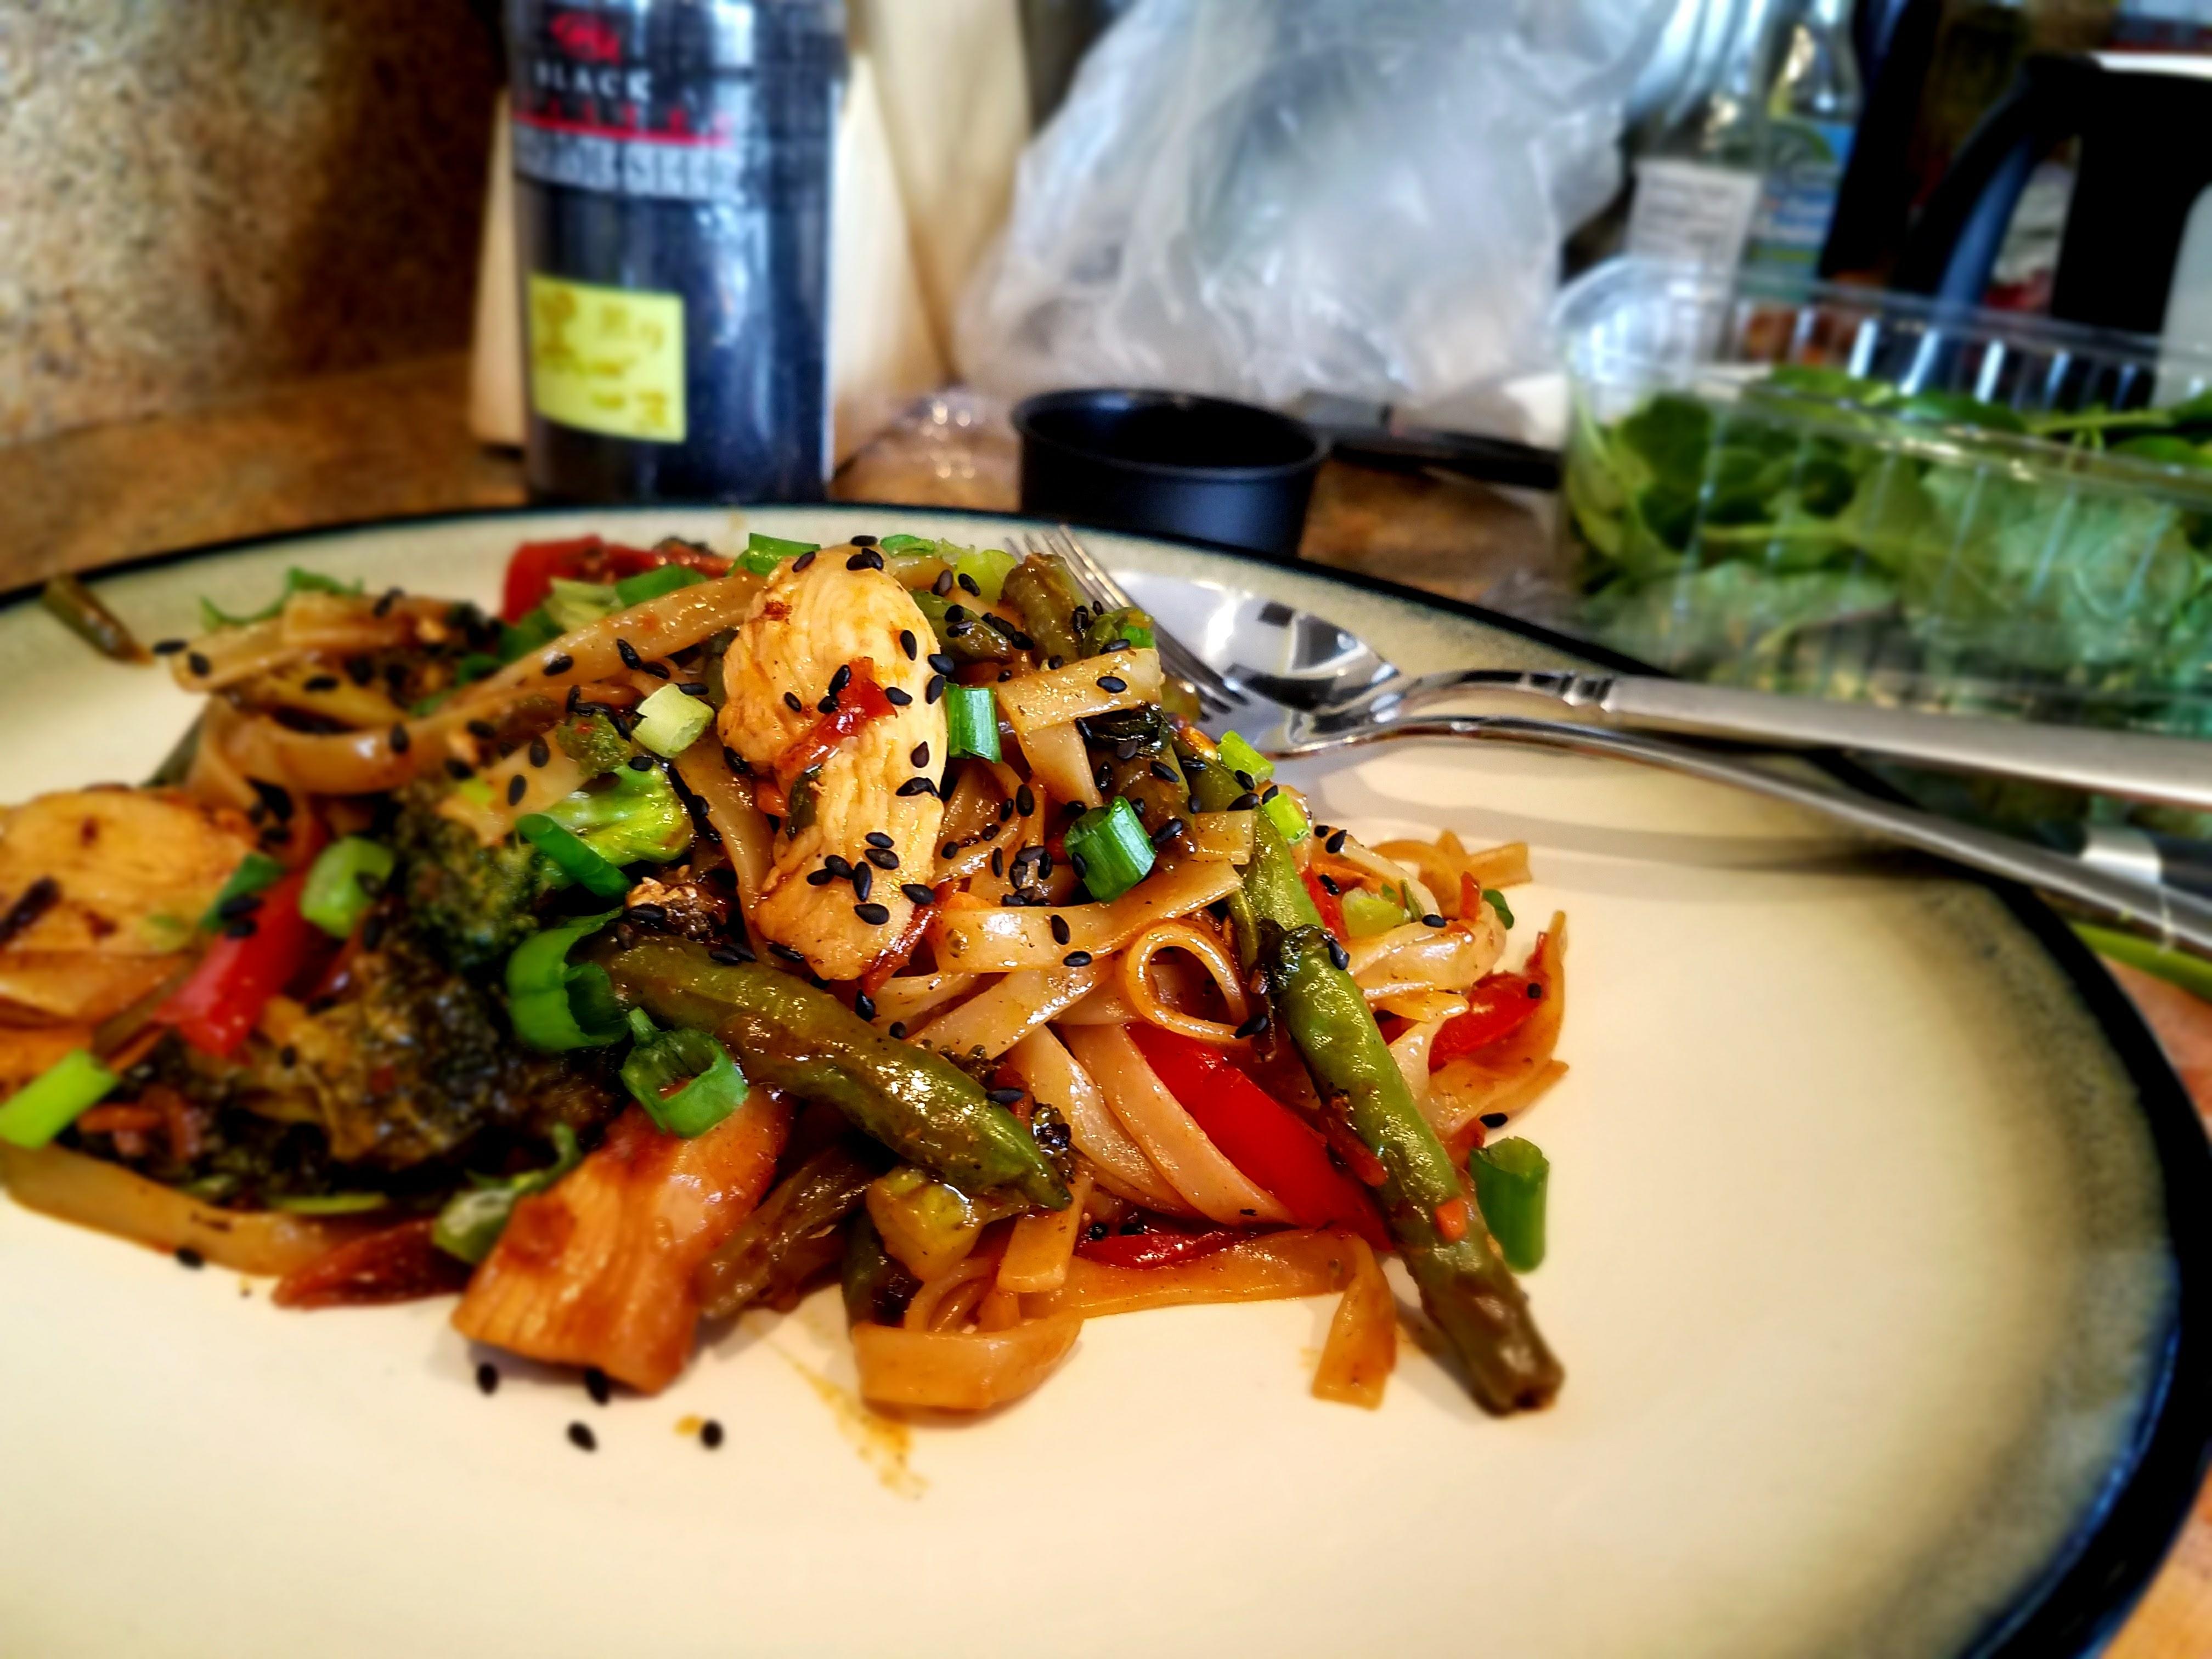 Asian Chicken Noodle Stir-fry